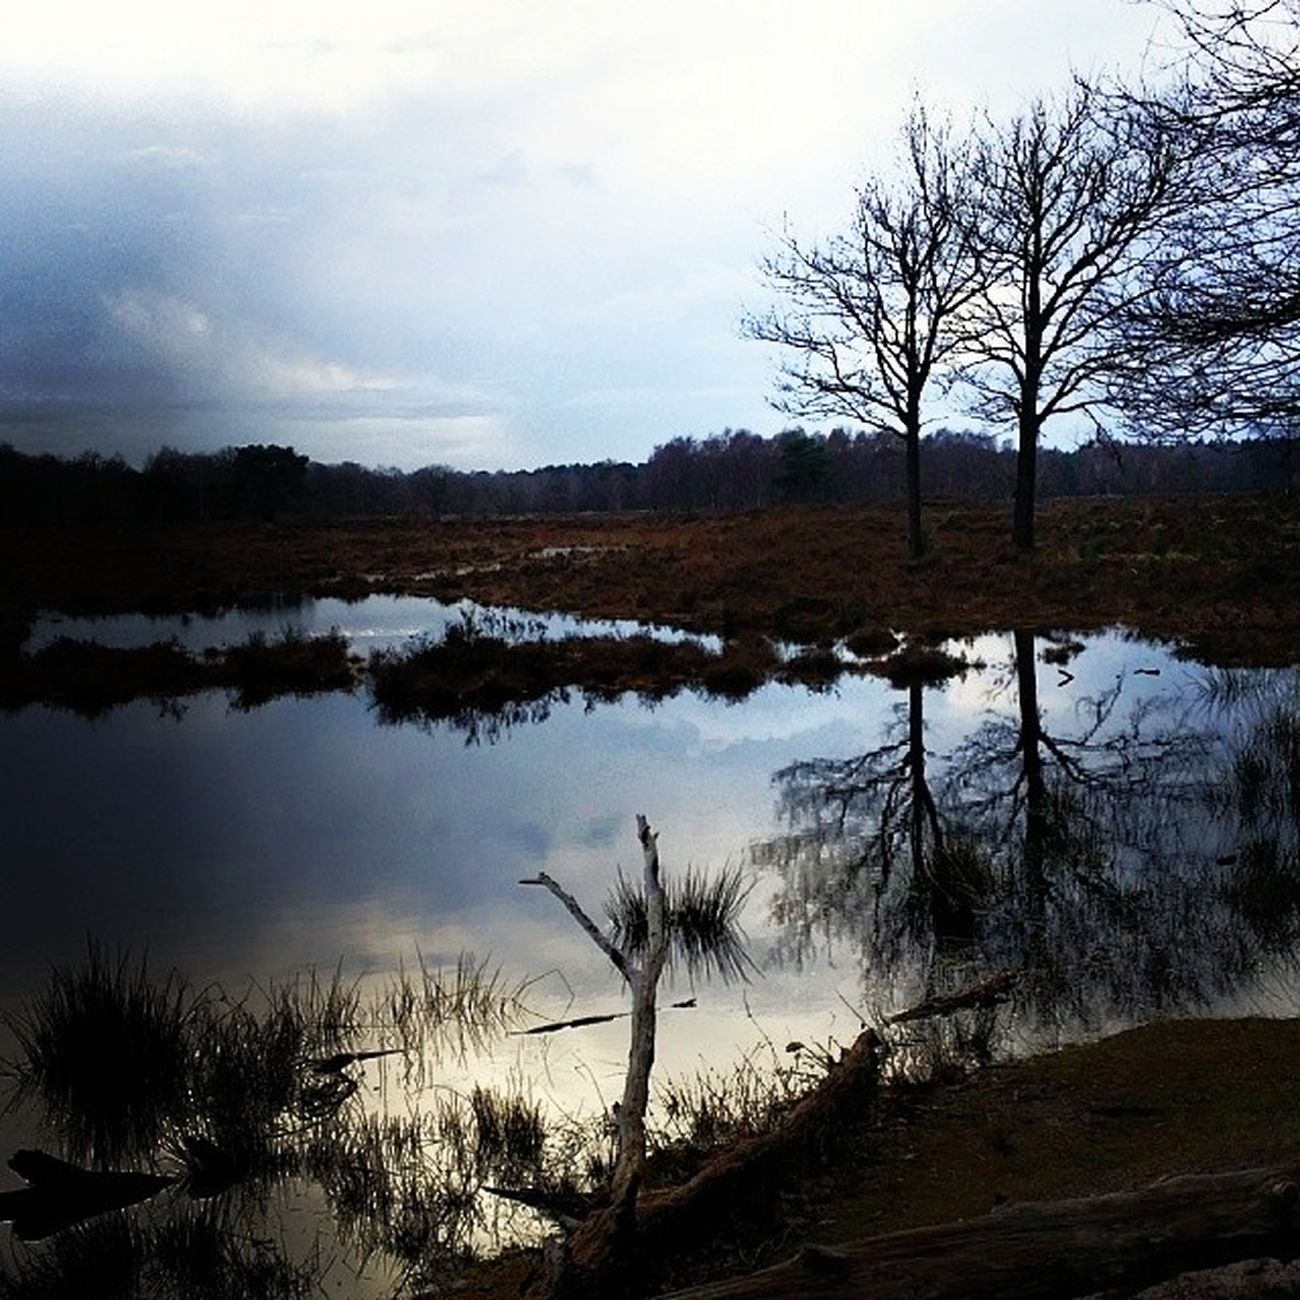 Beautiful Scenery Walkway Trail Tree Reflections Light Sky Netherlands Vursche Today Nature Oneofmyfavouritewalks